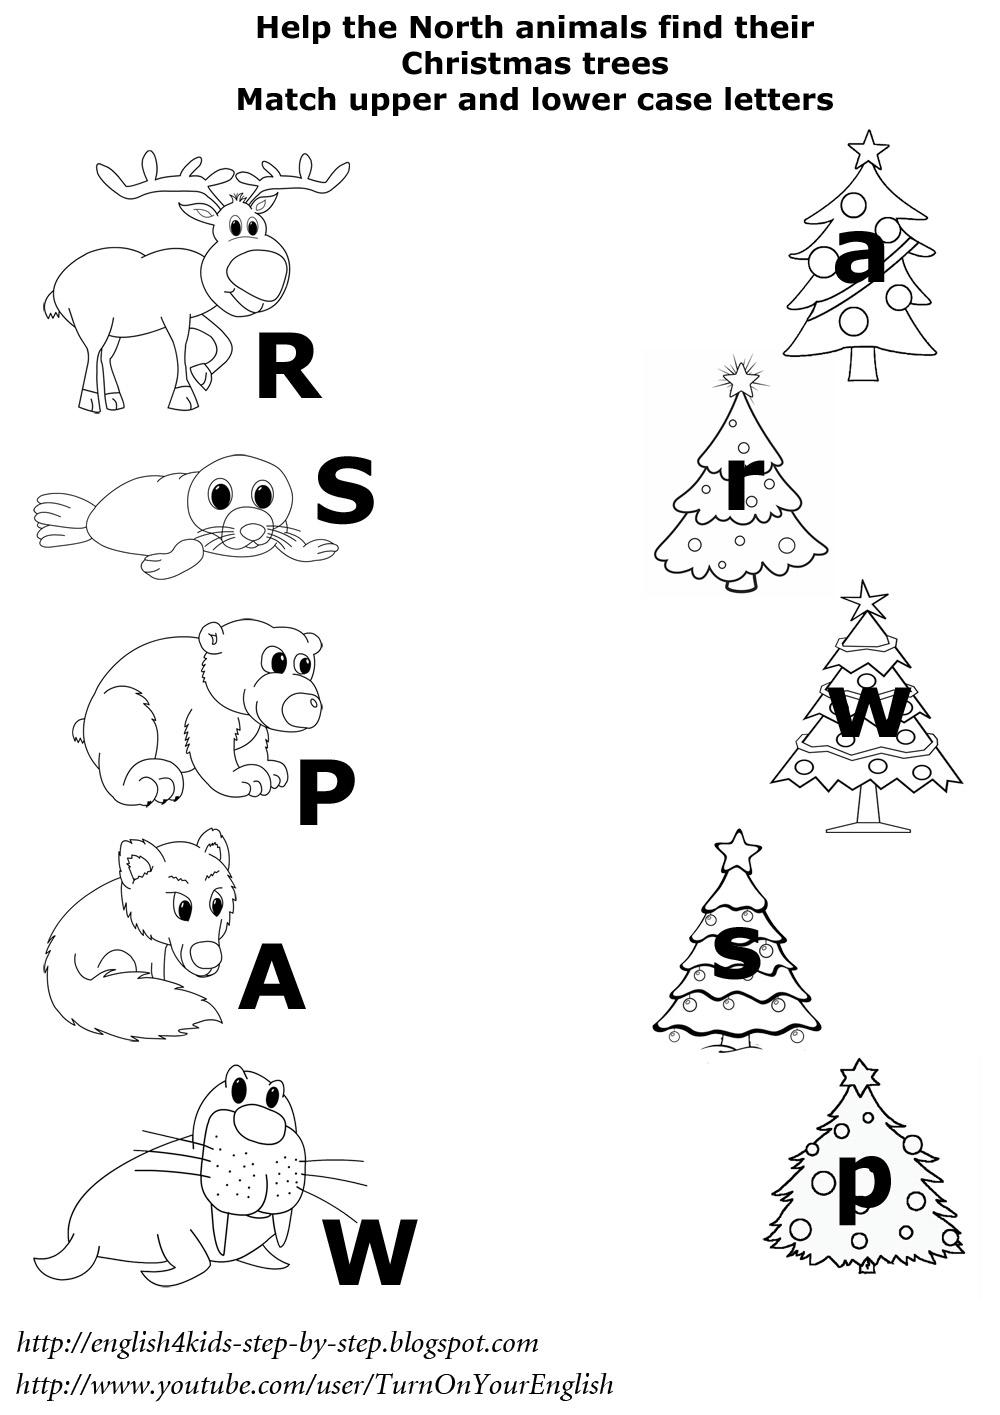 13 Best Images of Animal Matching Worksheet Kindergarten